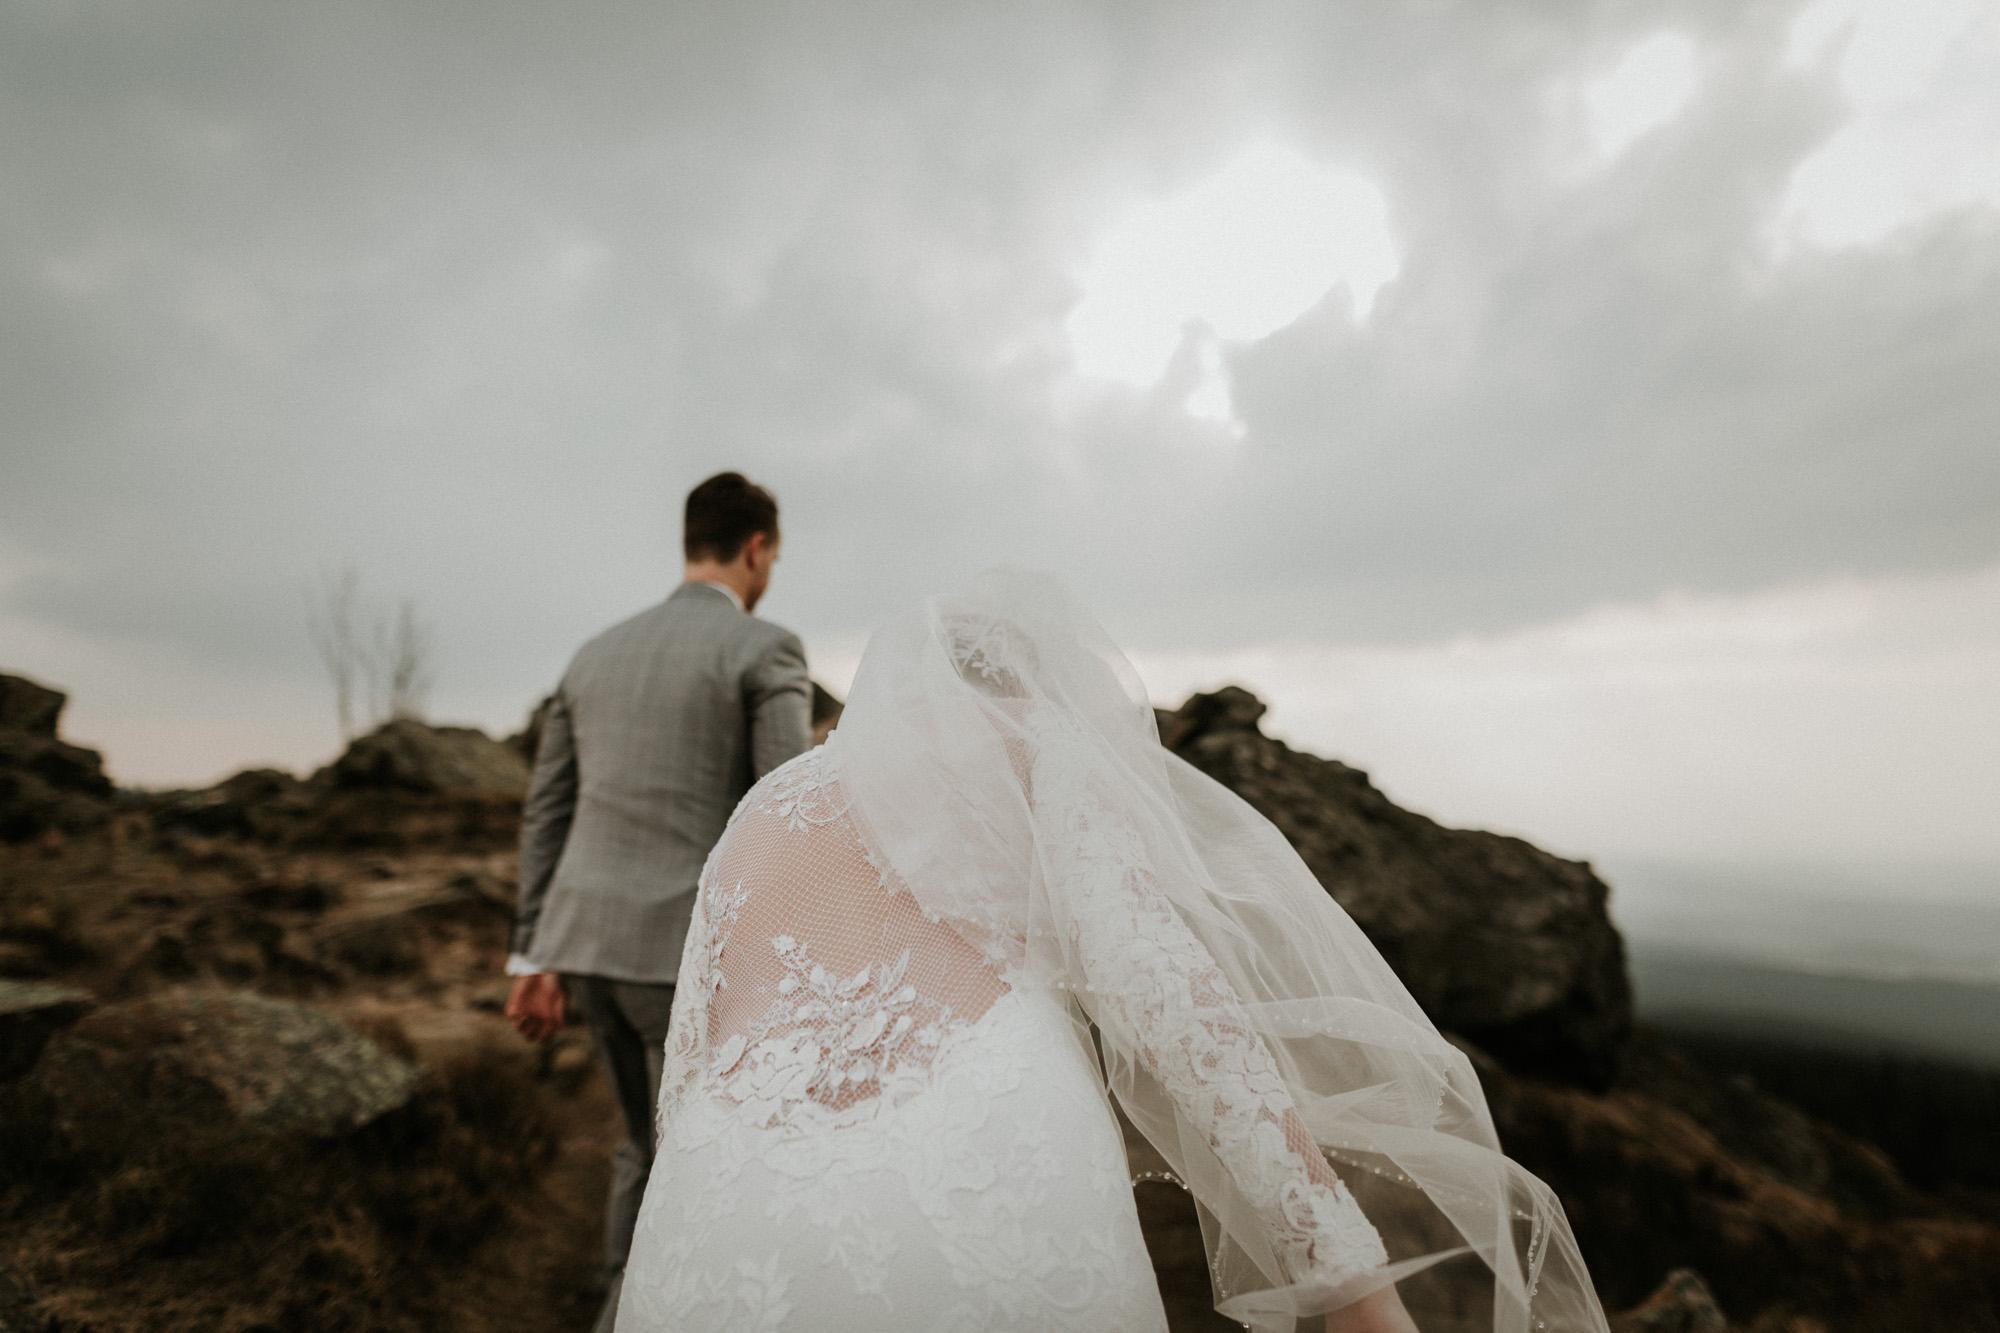 DanielaMarquardtPhotography_Hochzeitsfotograf_Düsseldorf_Köln_Mallorca_Bayern_Austria_Harz_LinaundMaik_Afterwedding-Shooting_Weddingphotographer_Ibiza_Tuskany_Italien_Toskana53